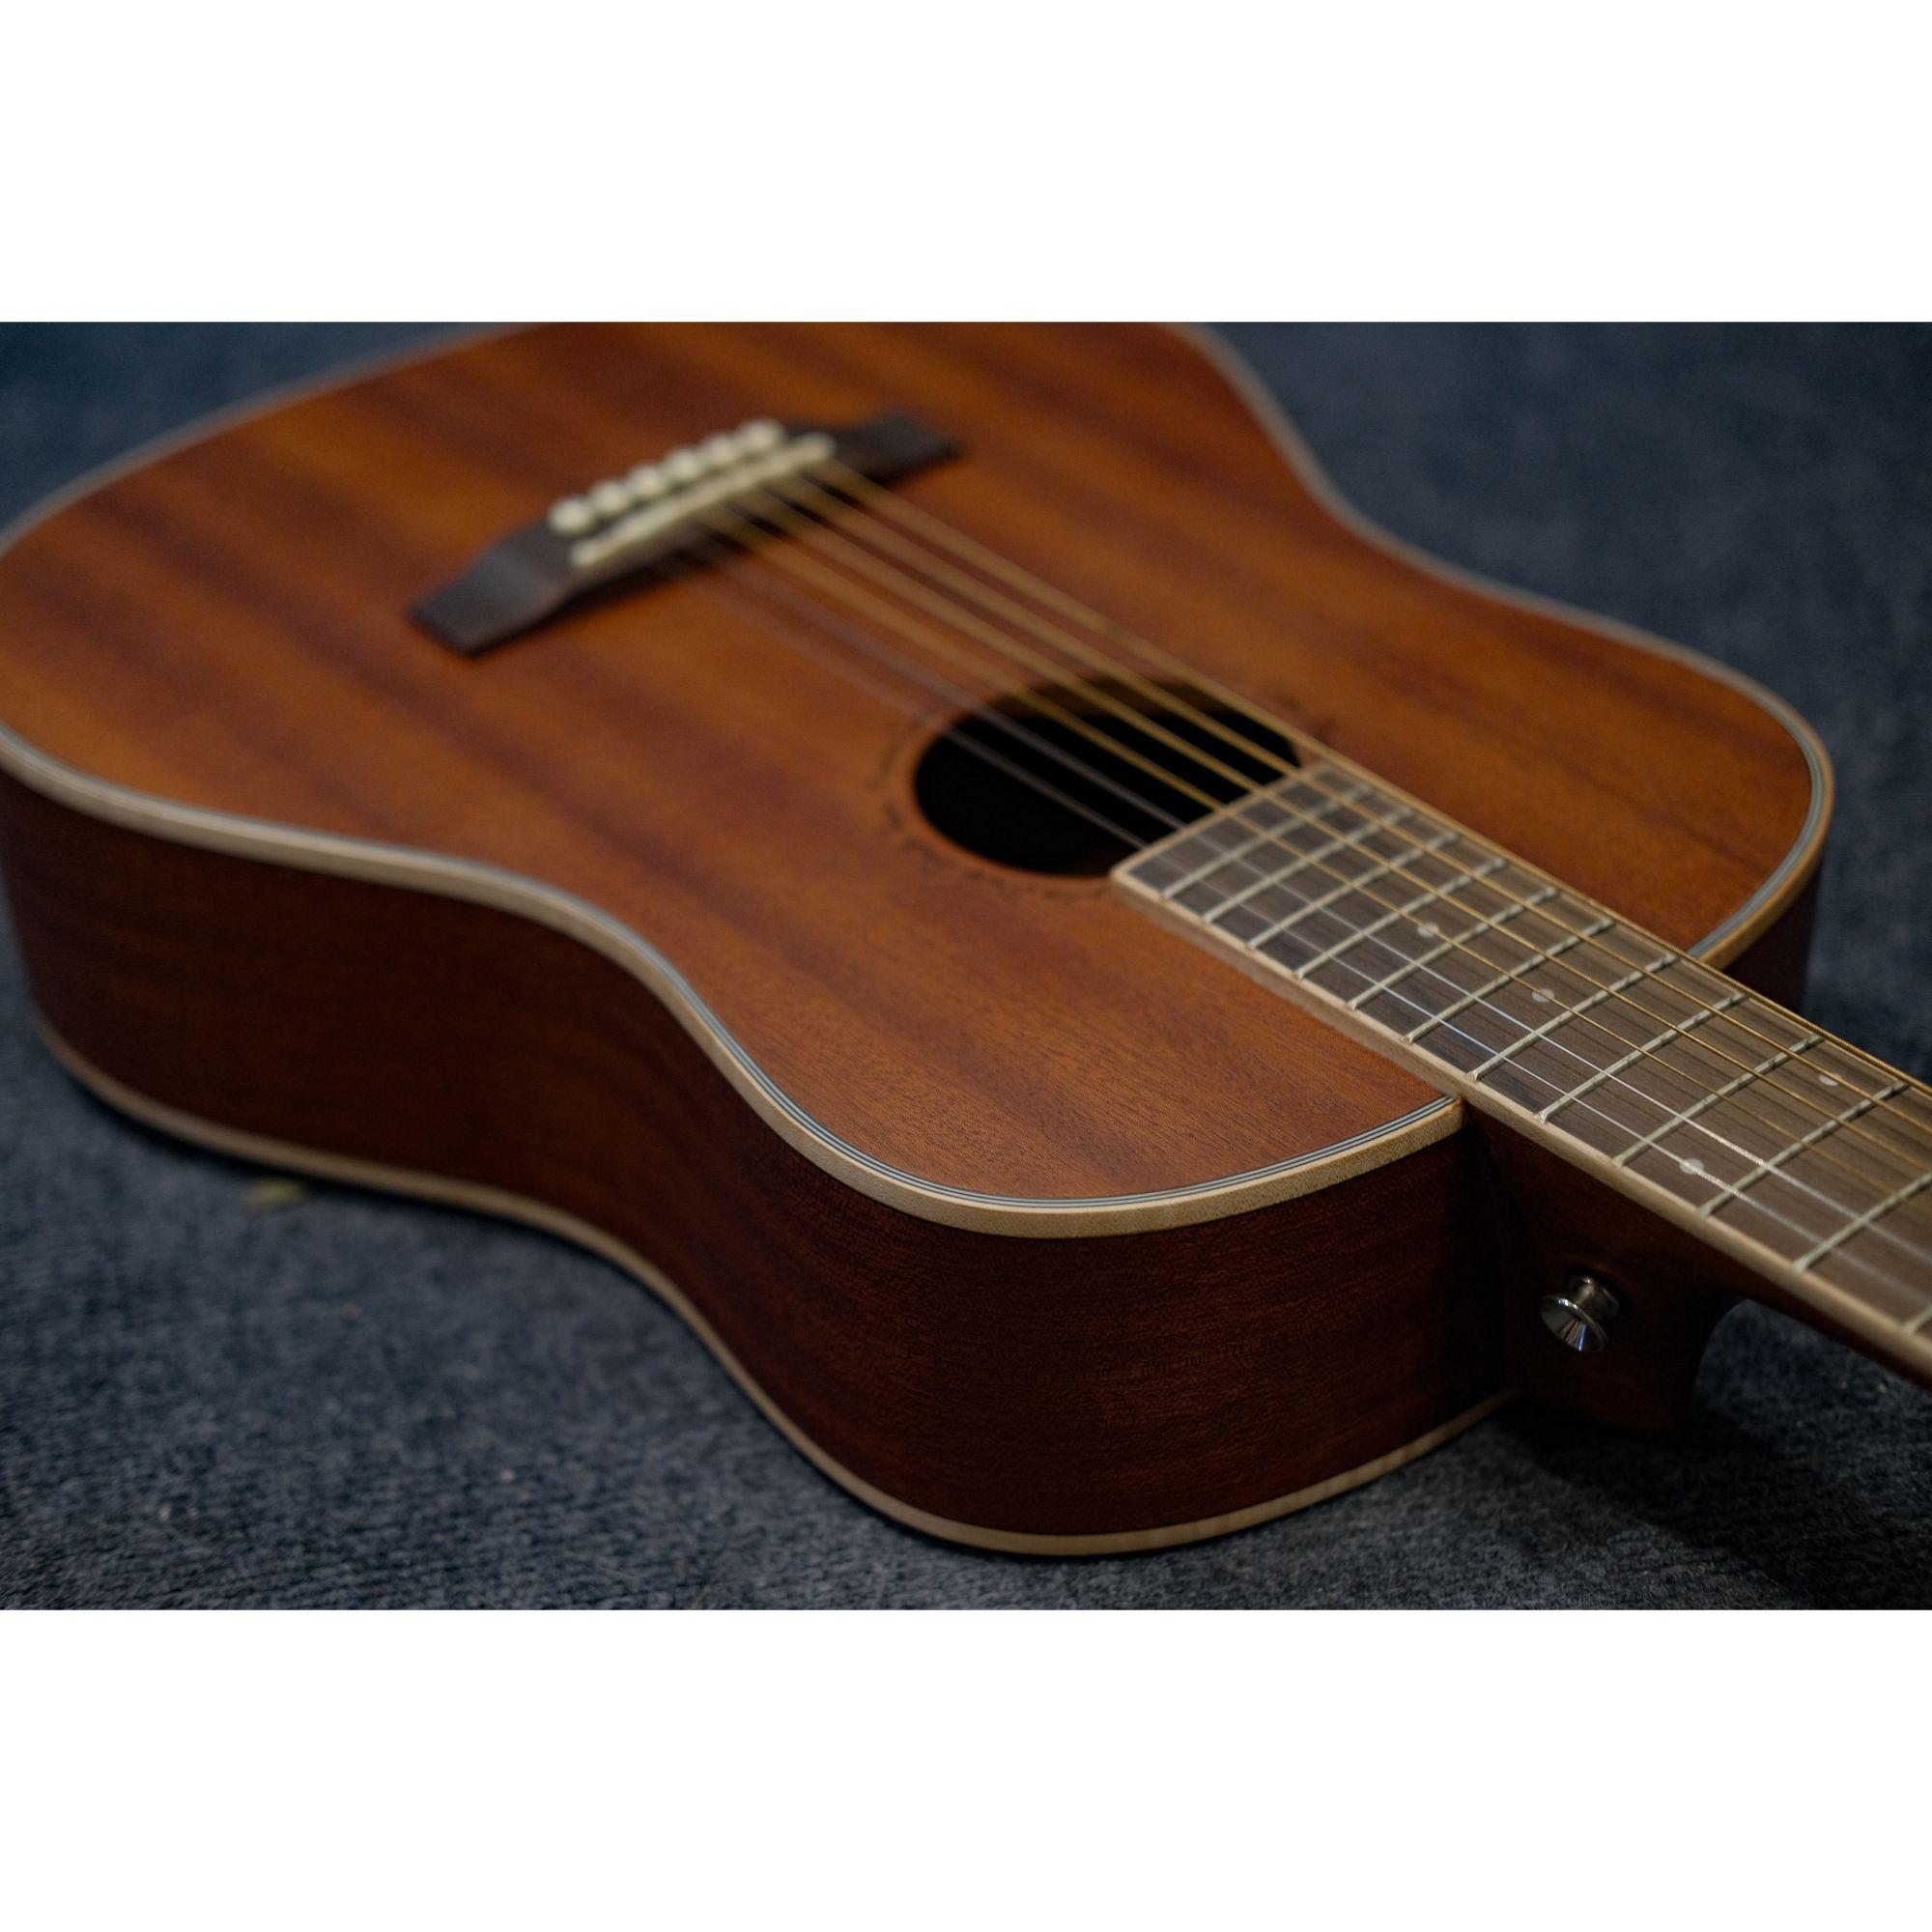 Richtone  RT MT BG2 34 inch Travel Acoustic Guitar - Mahogany